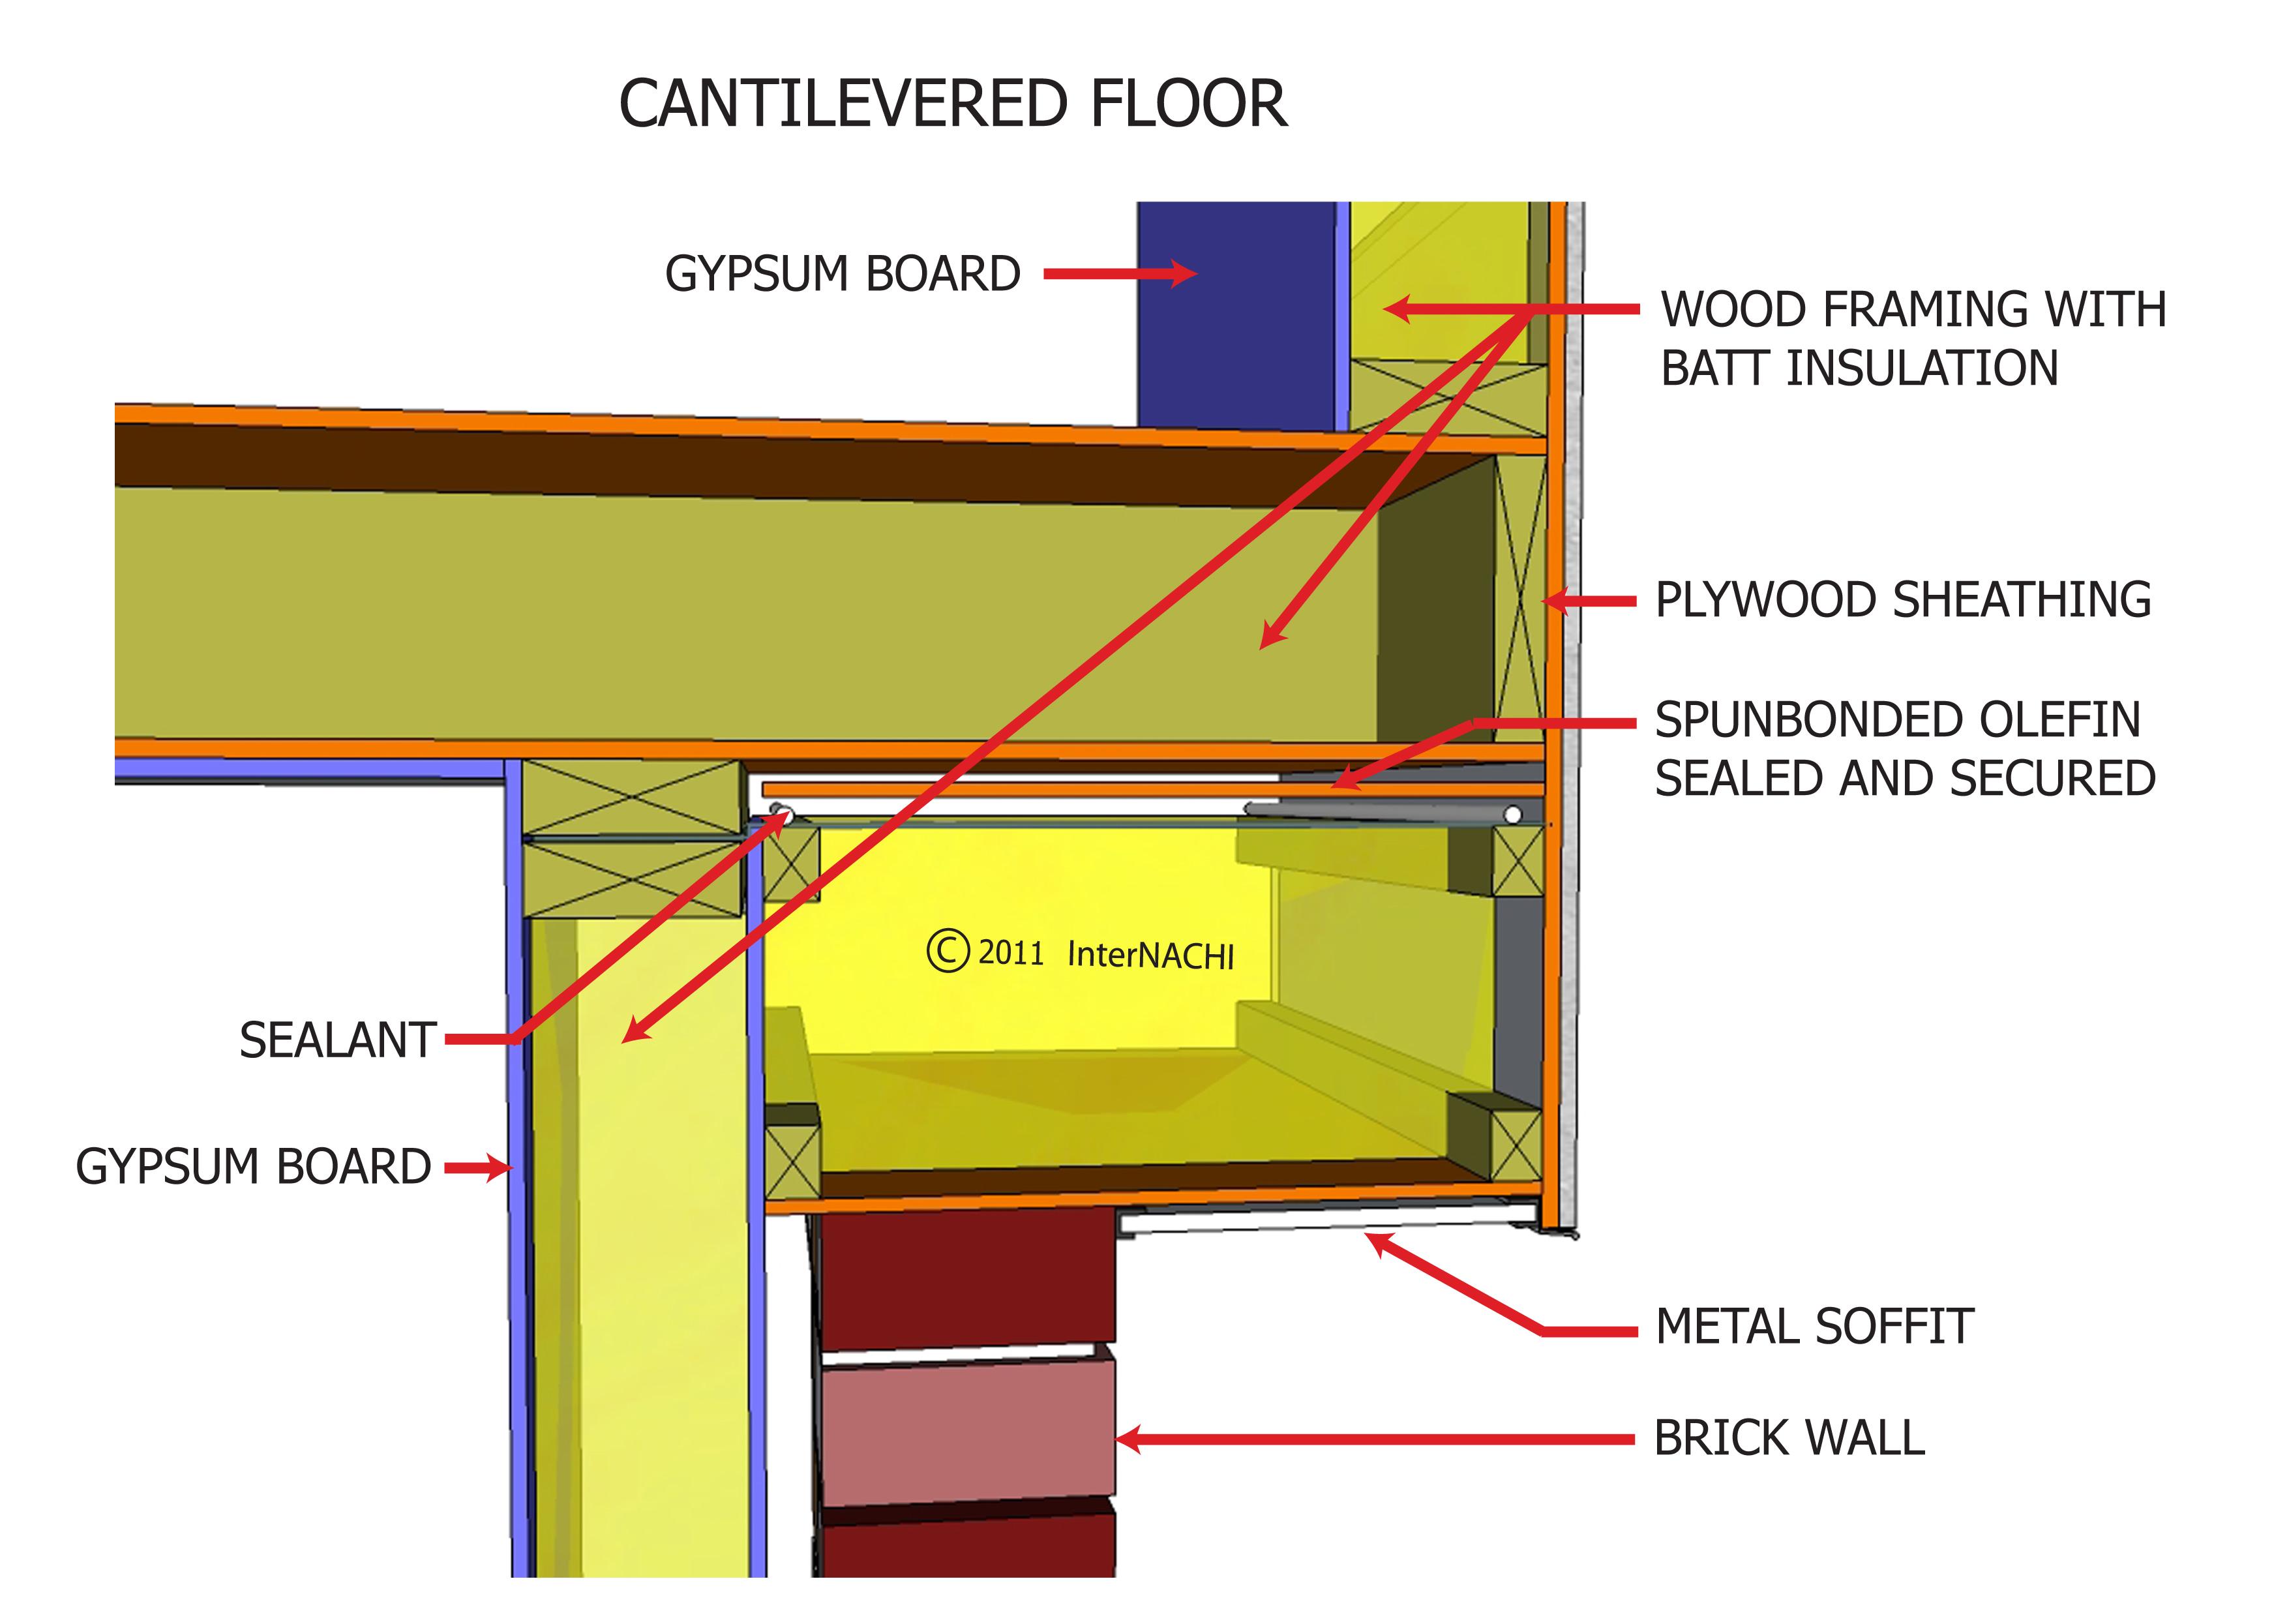 Cantilevered Floor